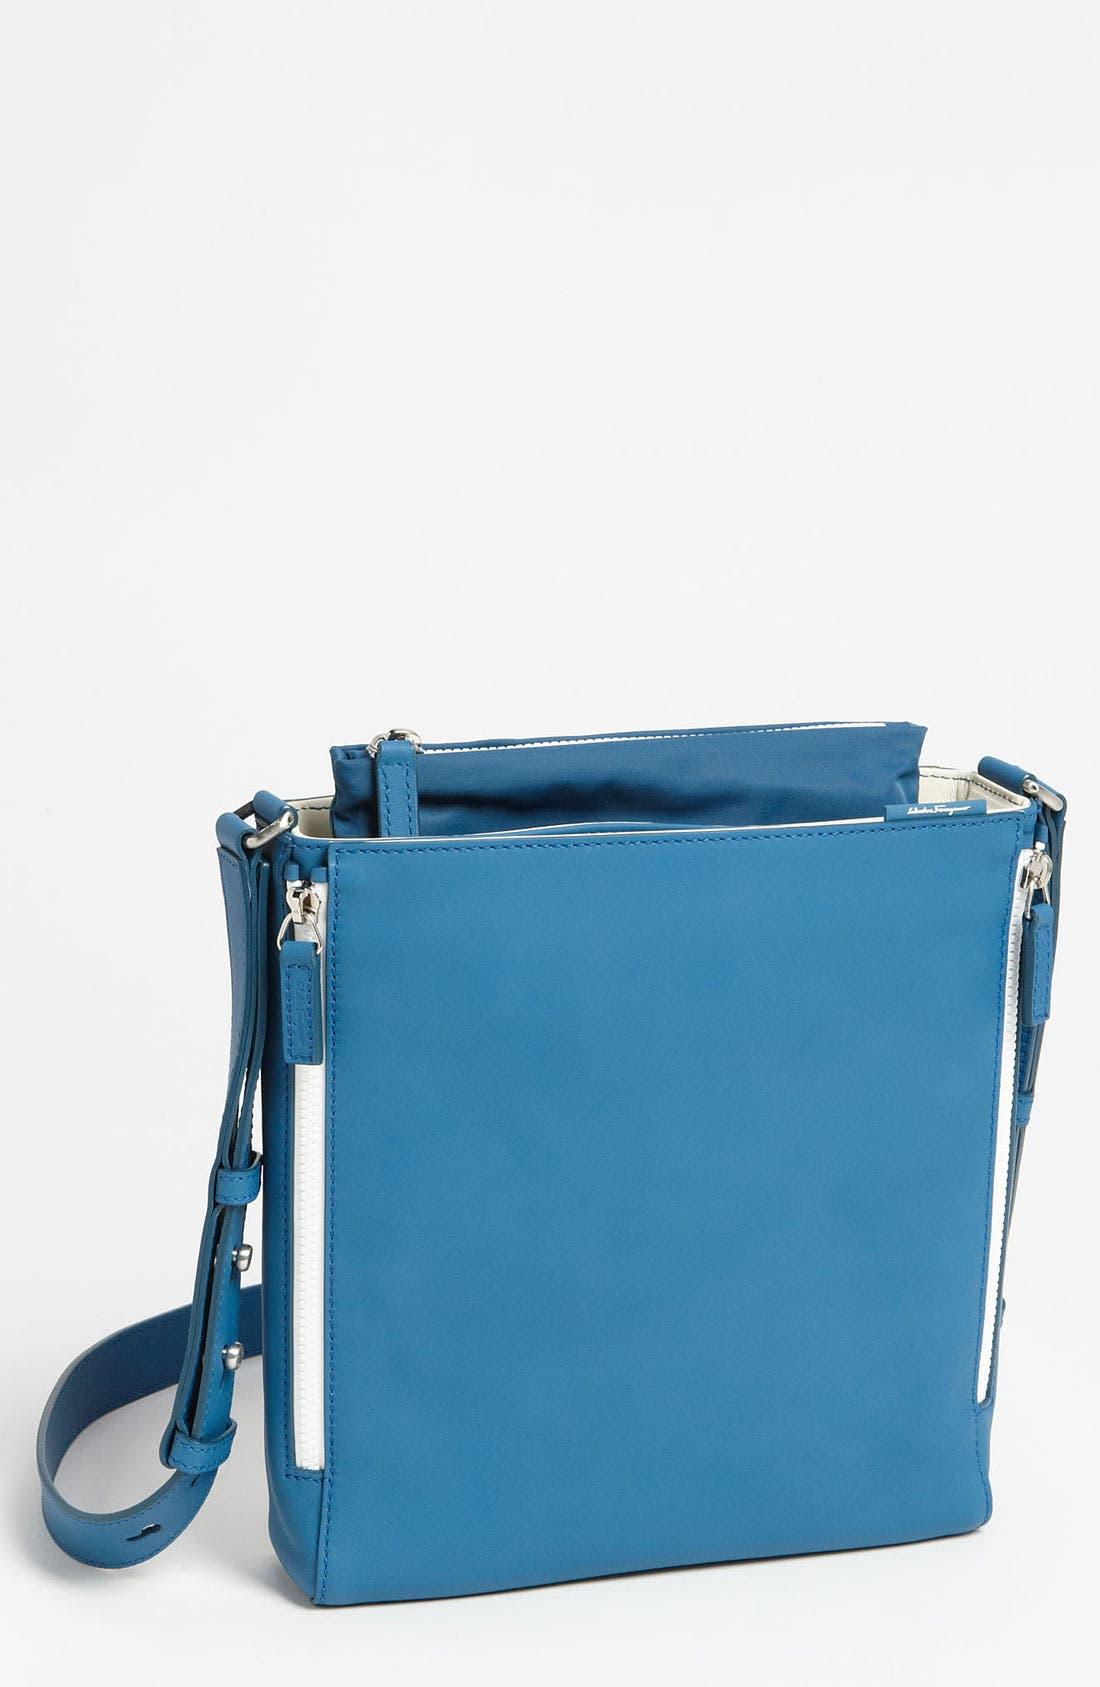 Main Image - Salvatore Ferragamo 'Pop' Shoulder Bag